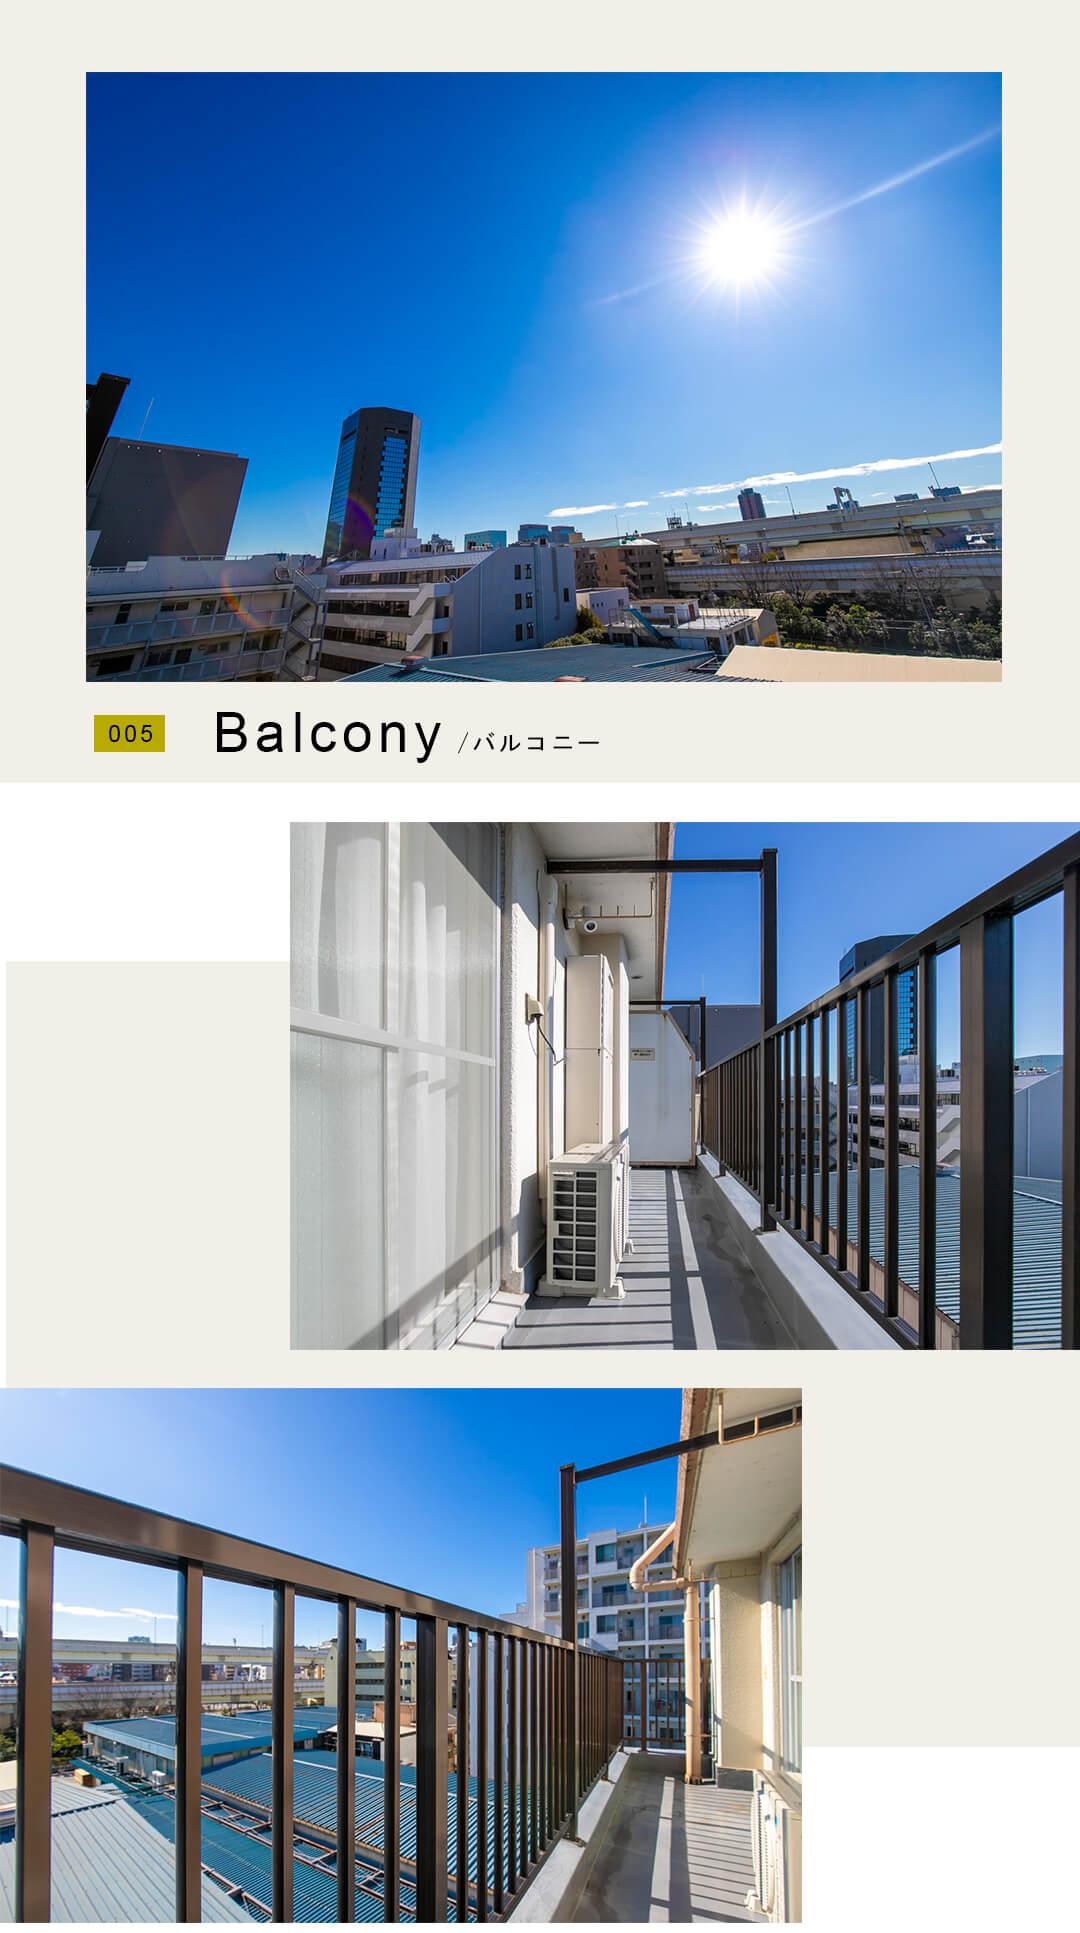 005,Balcony,バルコニー